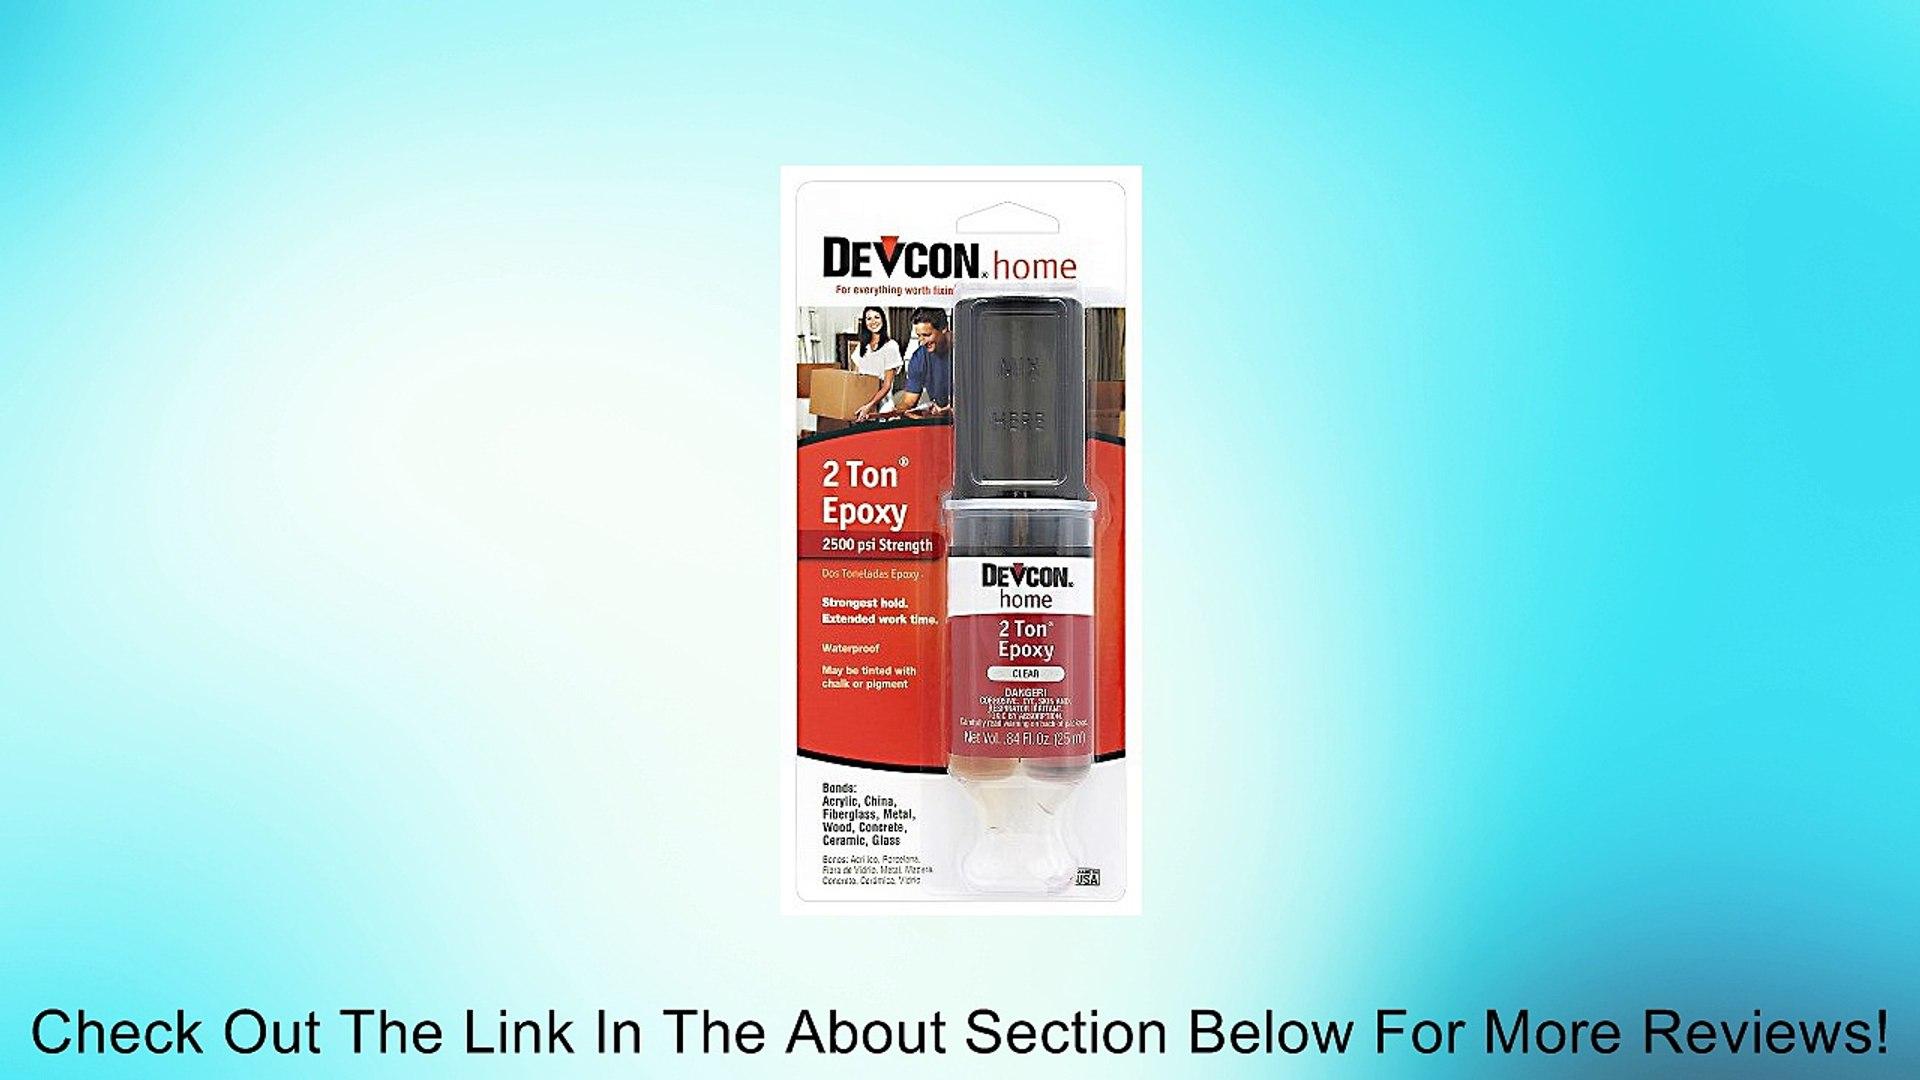 Devcon (31345-6PK) 2 Ton Epoxy - 25 ml Dev-Tube, (Pack of 6